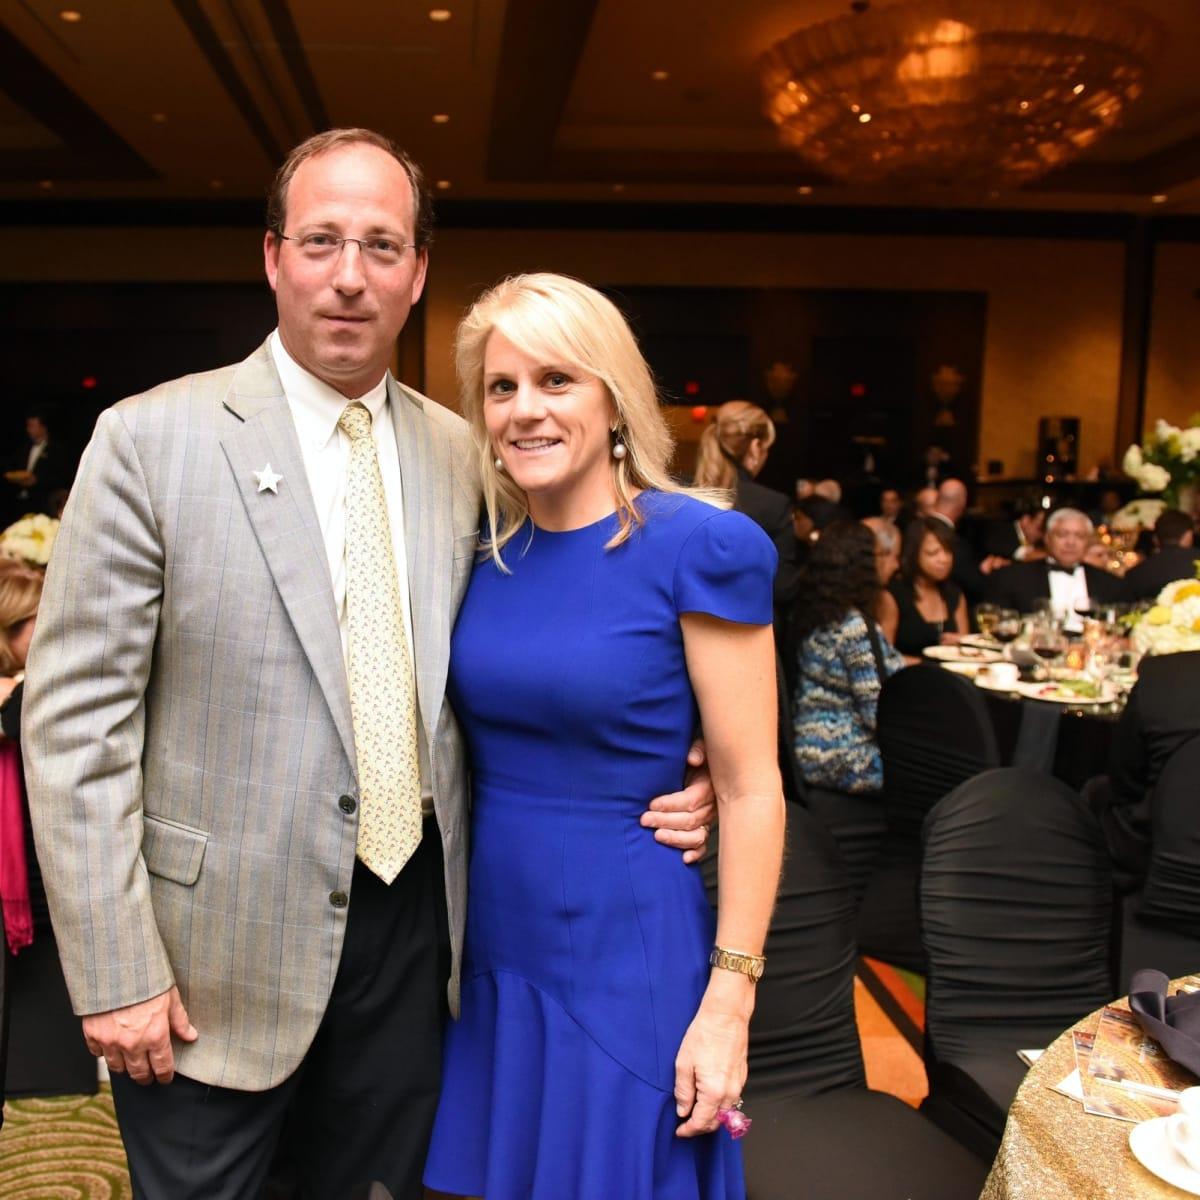 Houston, SER job for progress, October 2015, Duncan and Sarah Underwood